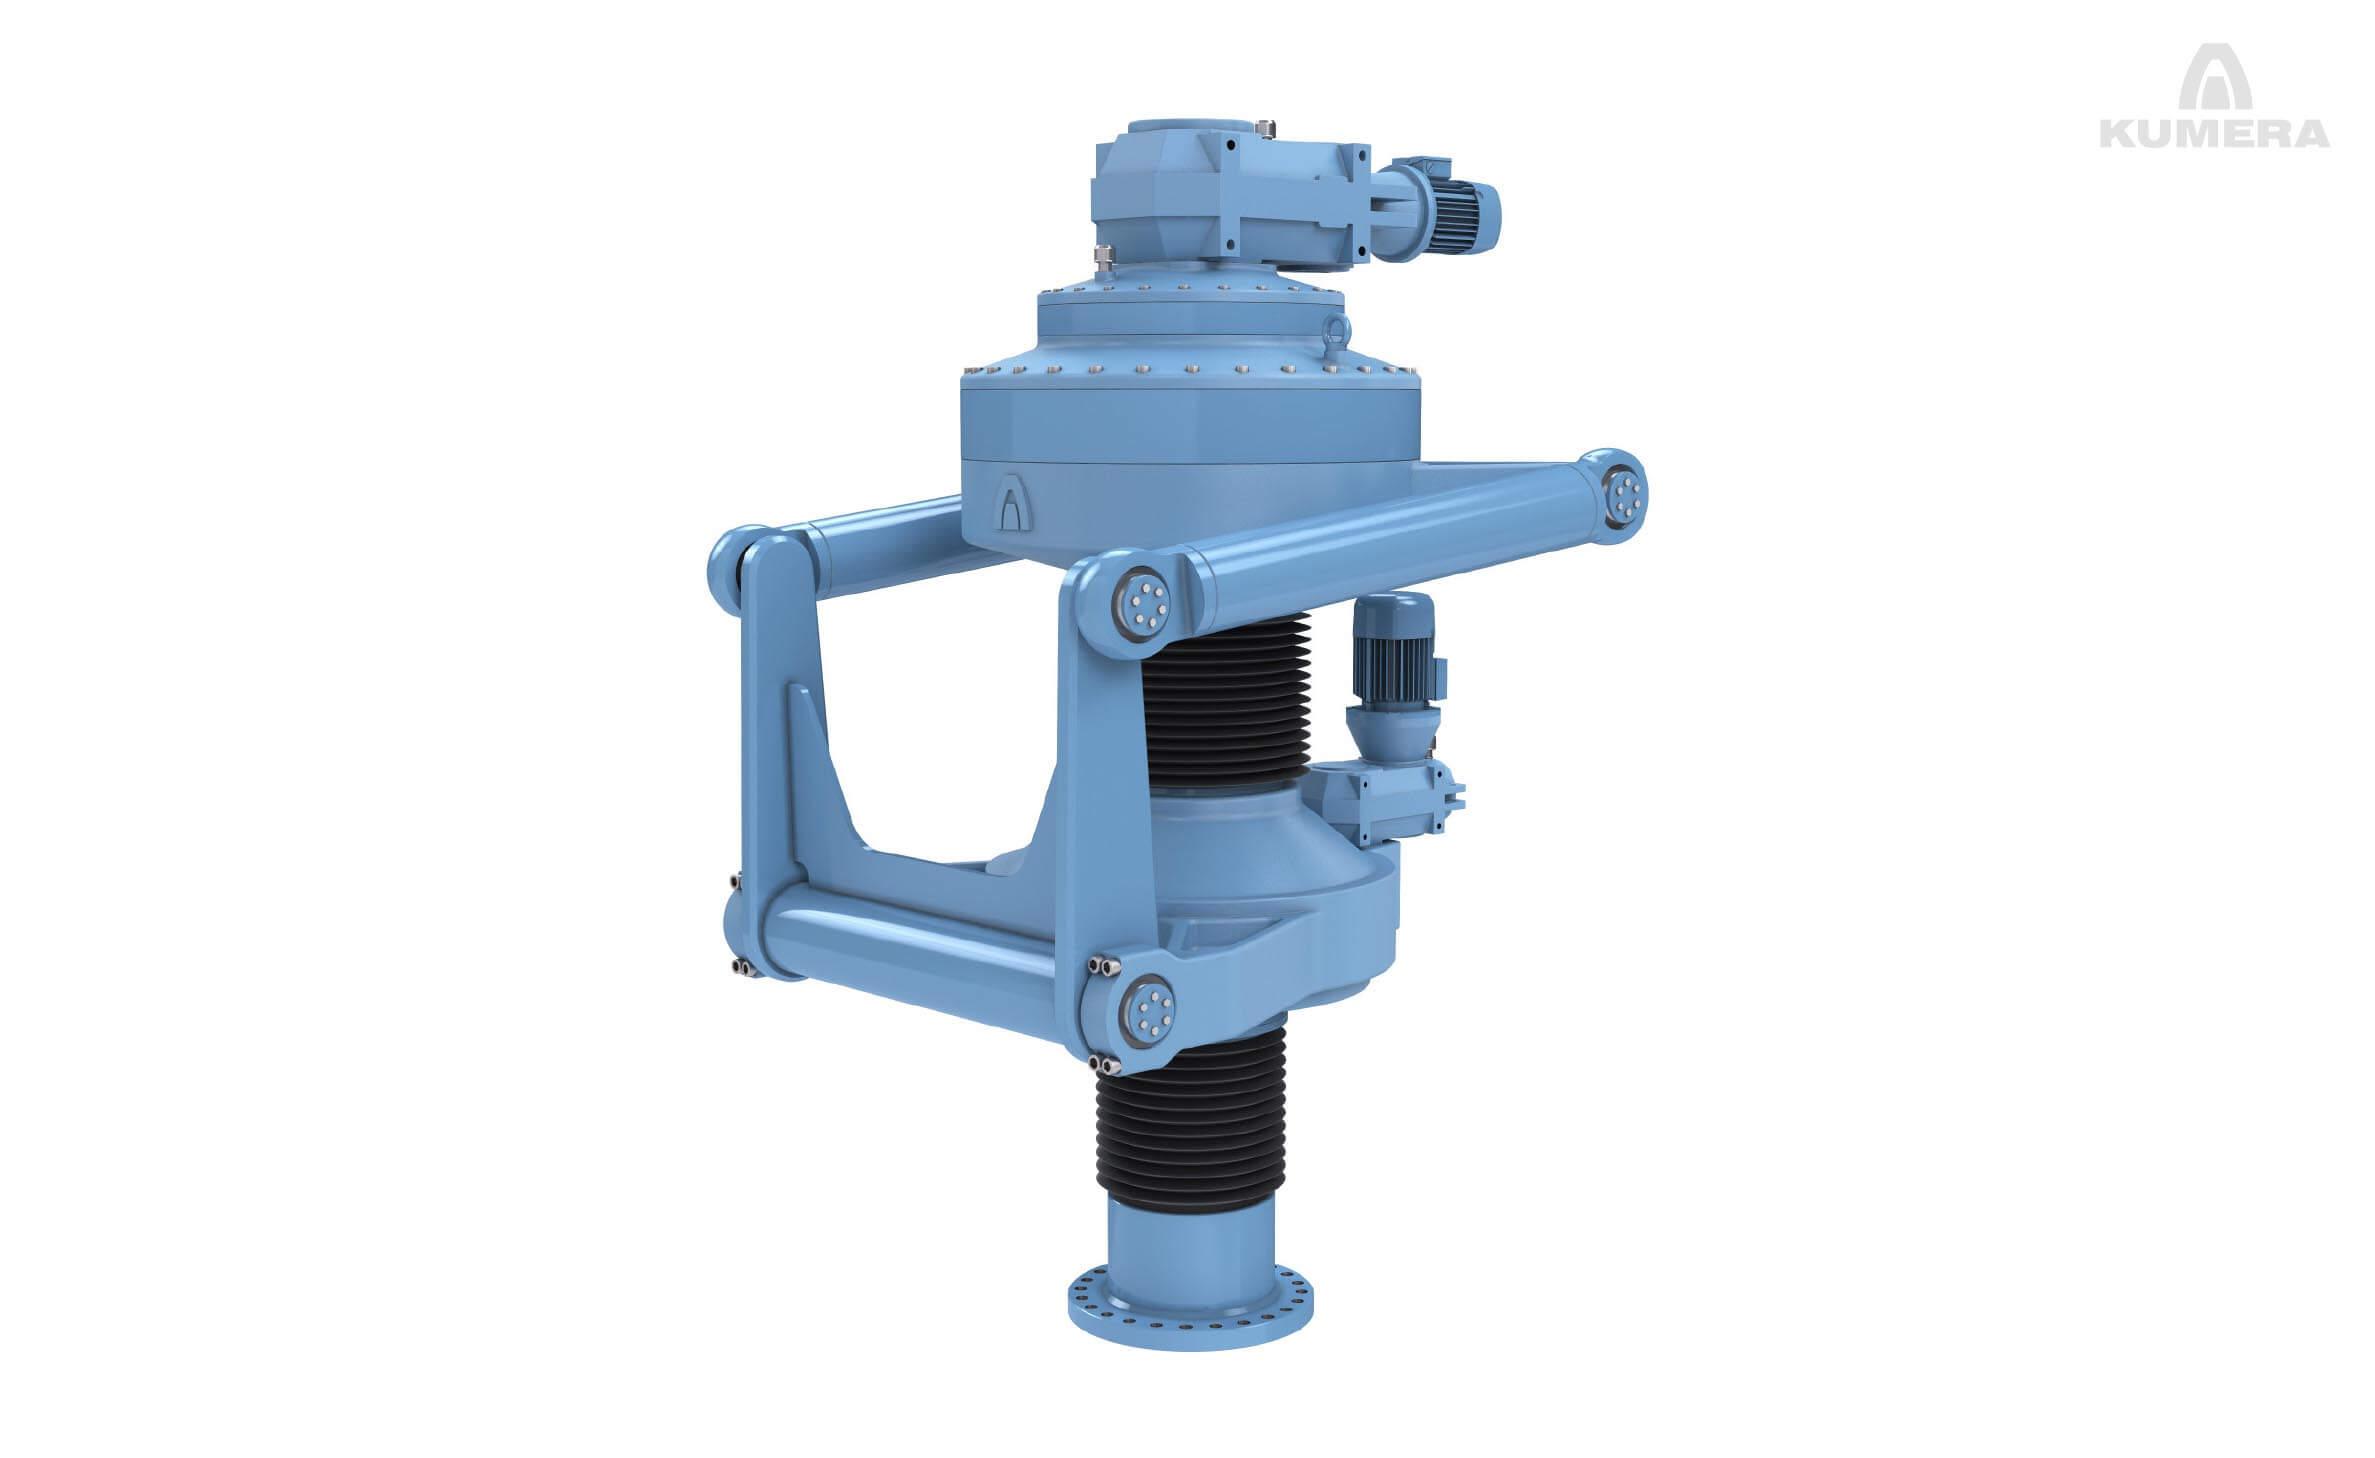 Kumera Drives for Water & Environment. Kumera Water & Environment processes: Surface aerators, Pump drives, Mixer drives, Sewage press drives, Waste kiln drive packages, Fermentation drum drive packages.